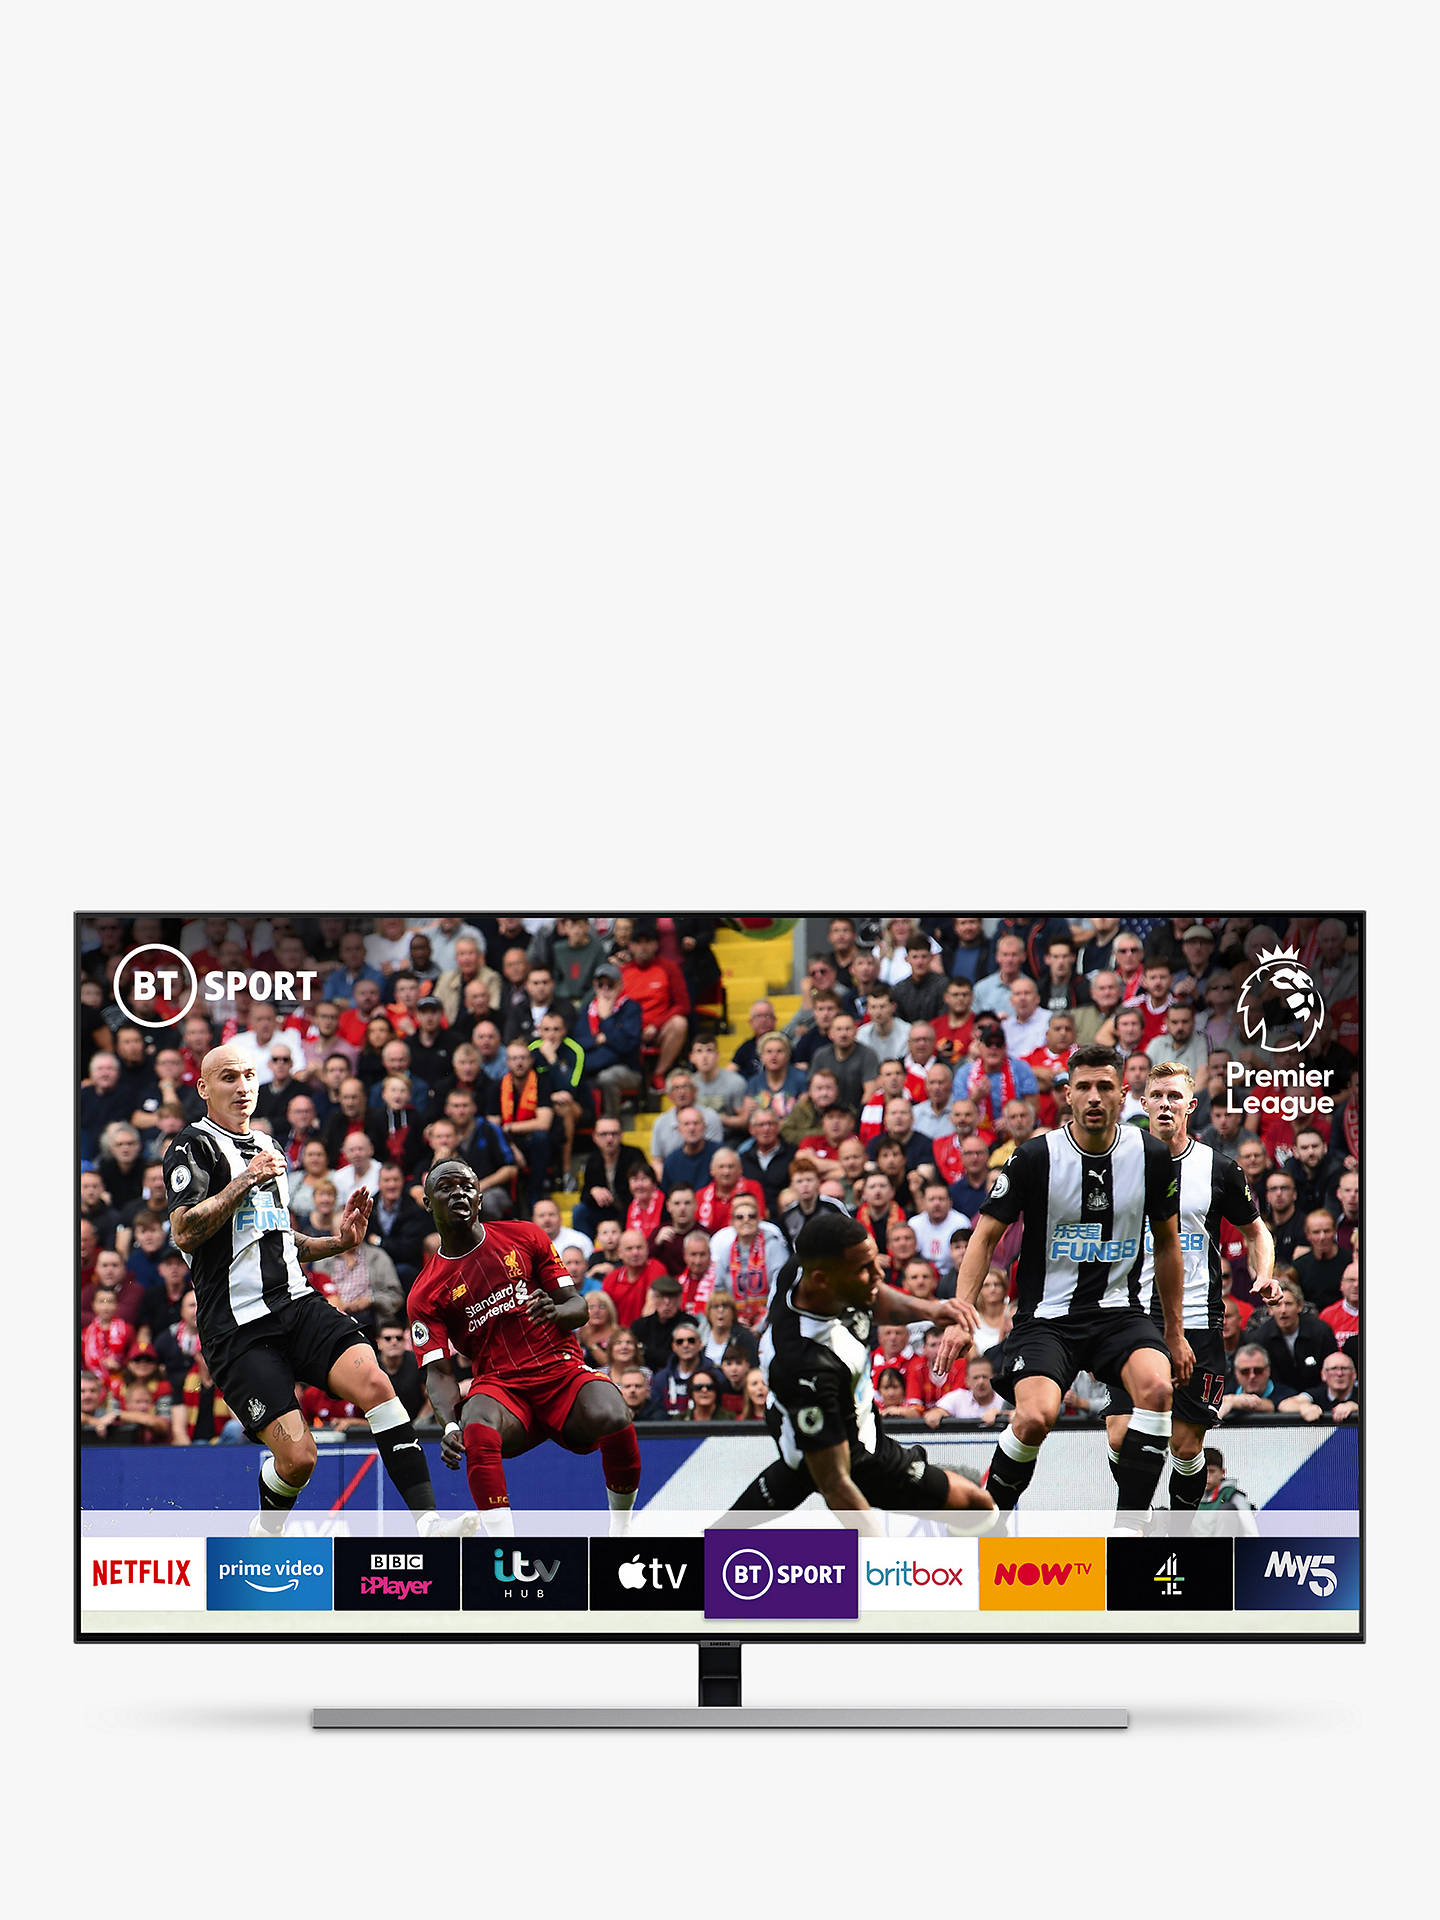 Samsung QE65Q80R (2019) QLED HDR 1500 4K Ultra HD Smart TV, 65